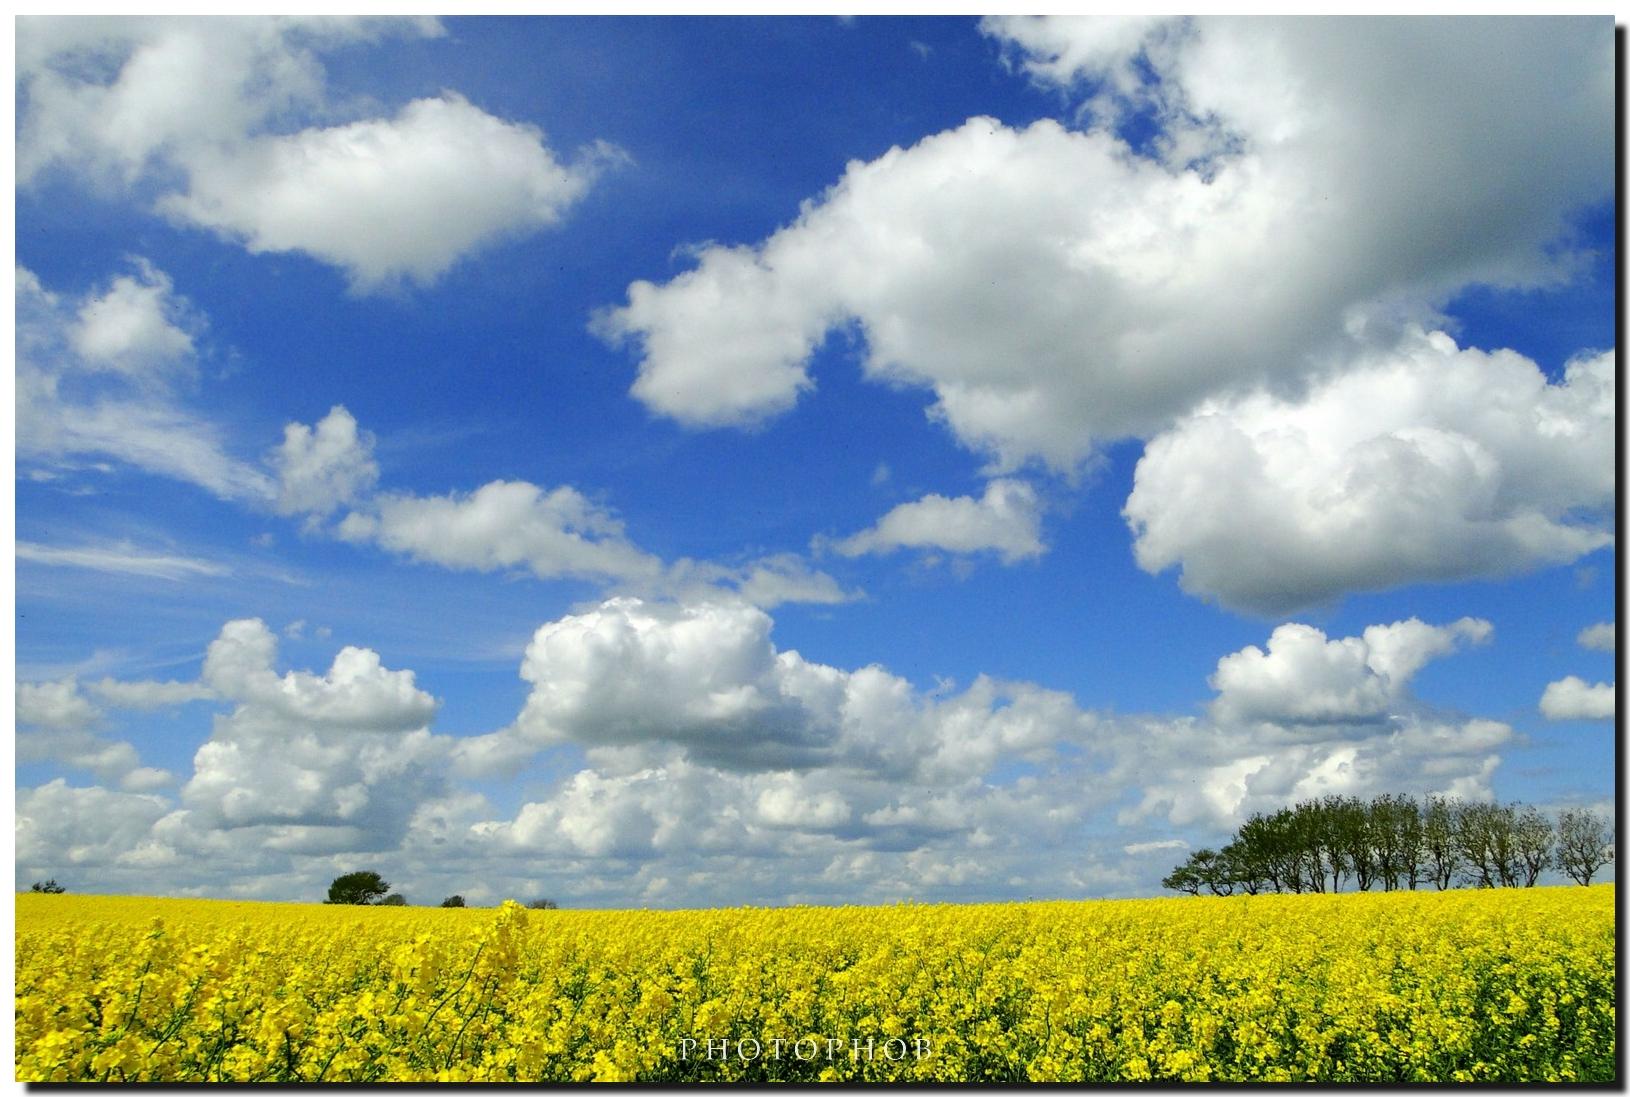 Fondo Primavera: Fondos De Pantalla : Mar, Cielo, Primavera, Rural